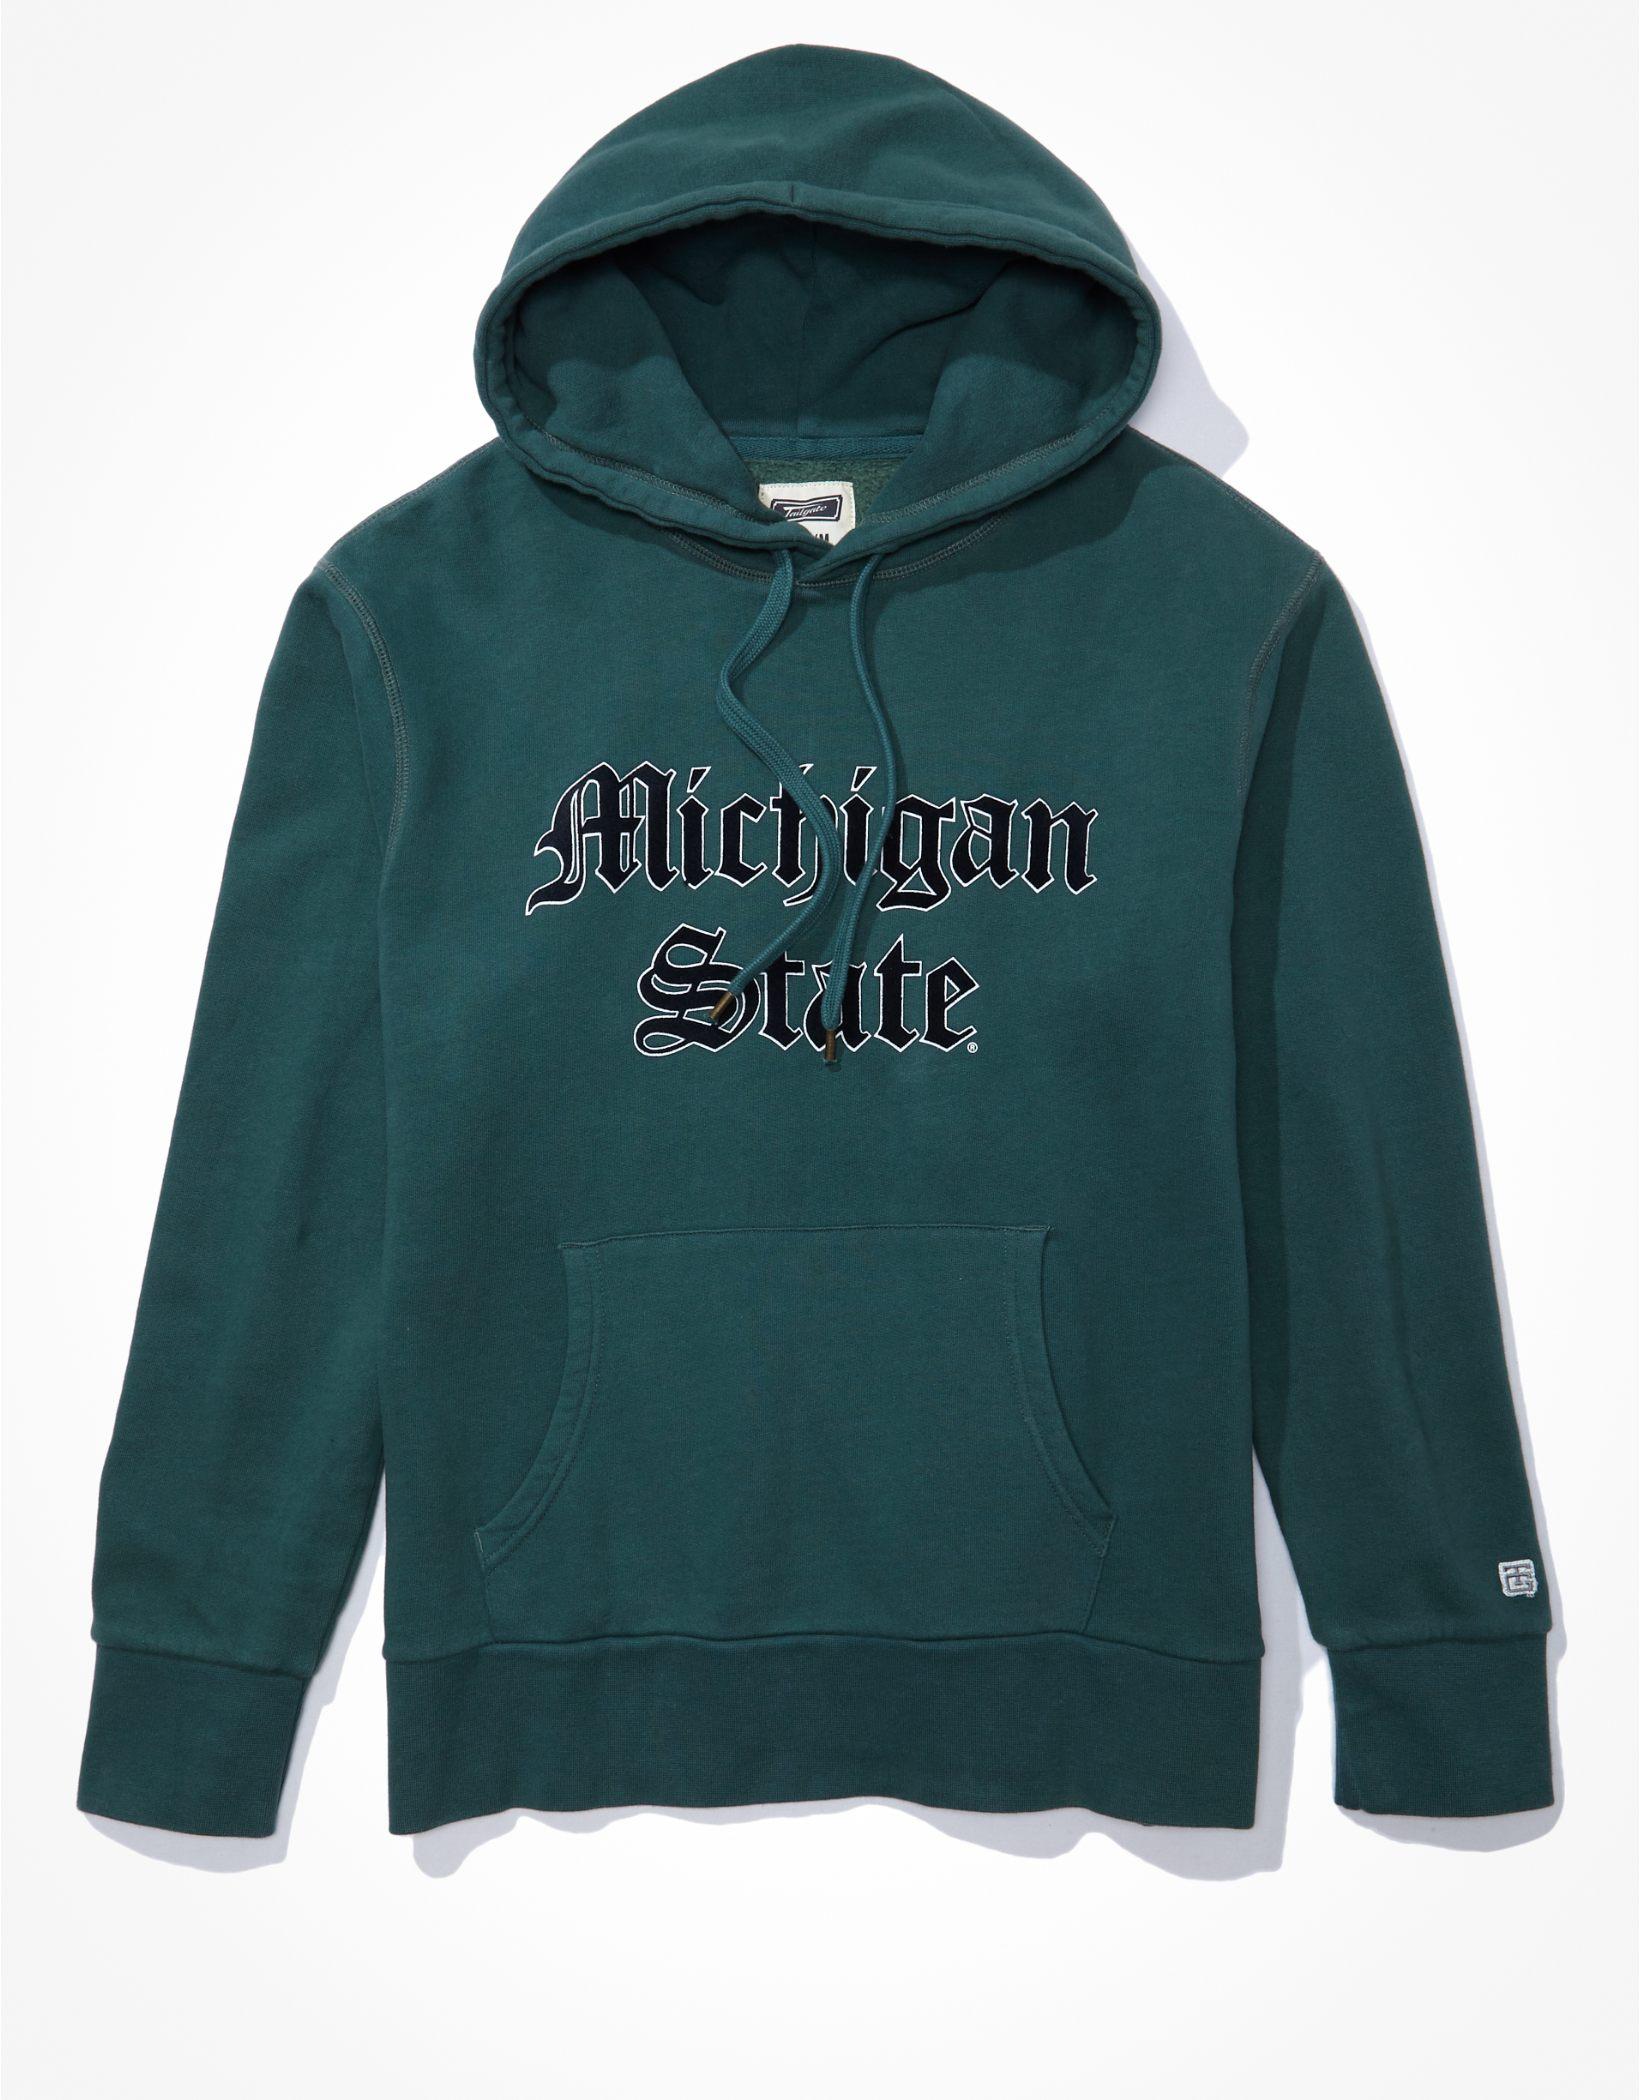 Tailgate Men's Michigan State Spartans Fleece Hoodie